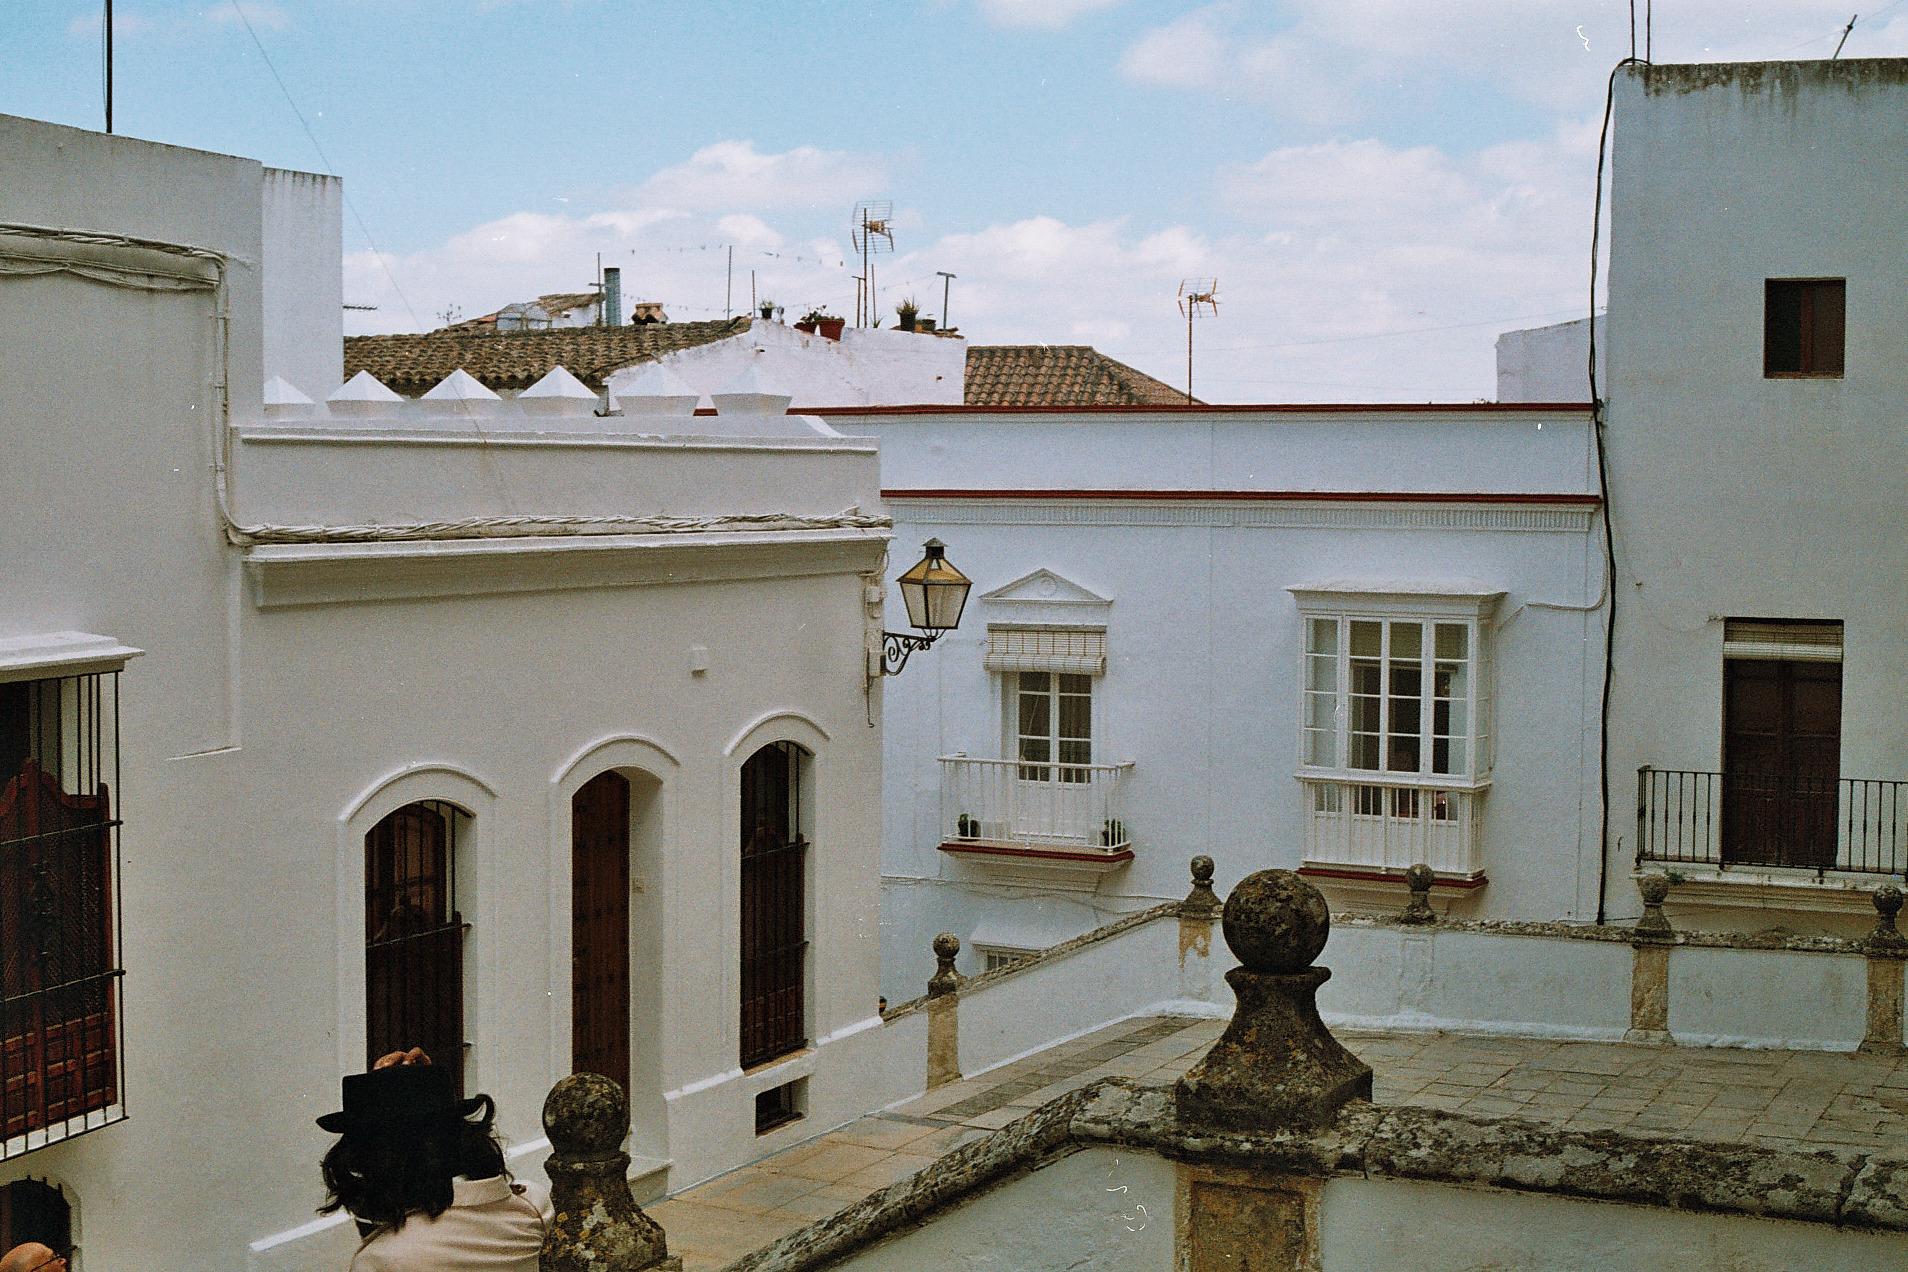 White Buildings